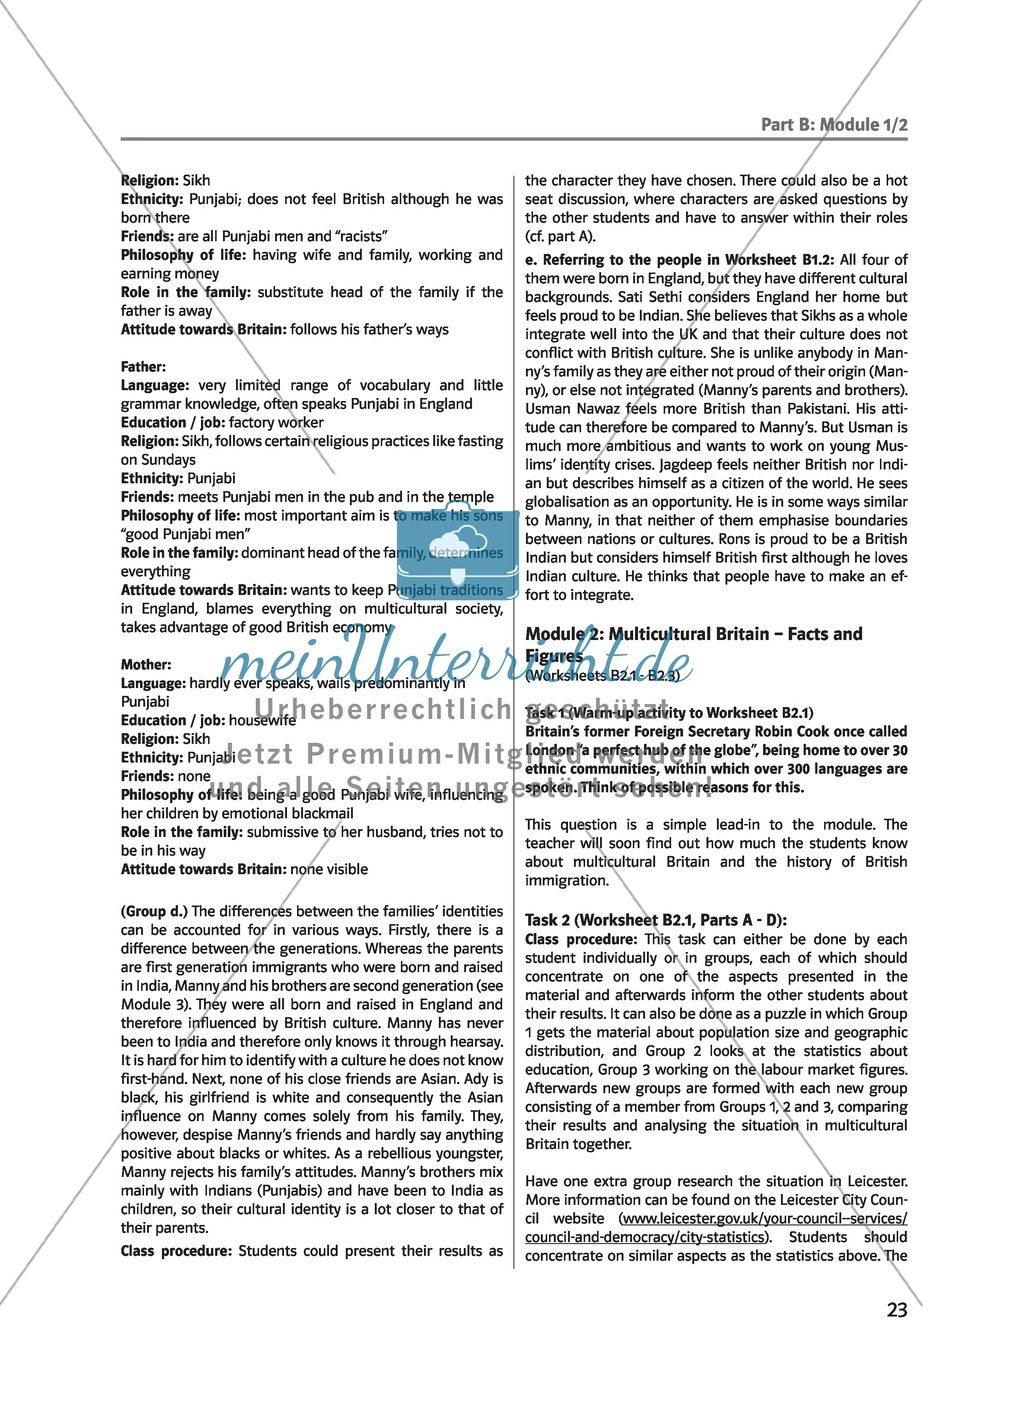 (Un)arranged marriage - Themen für die Oberstufe: Multicultural Britain - Facts and Figures Preview 0